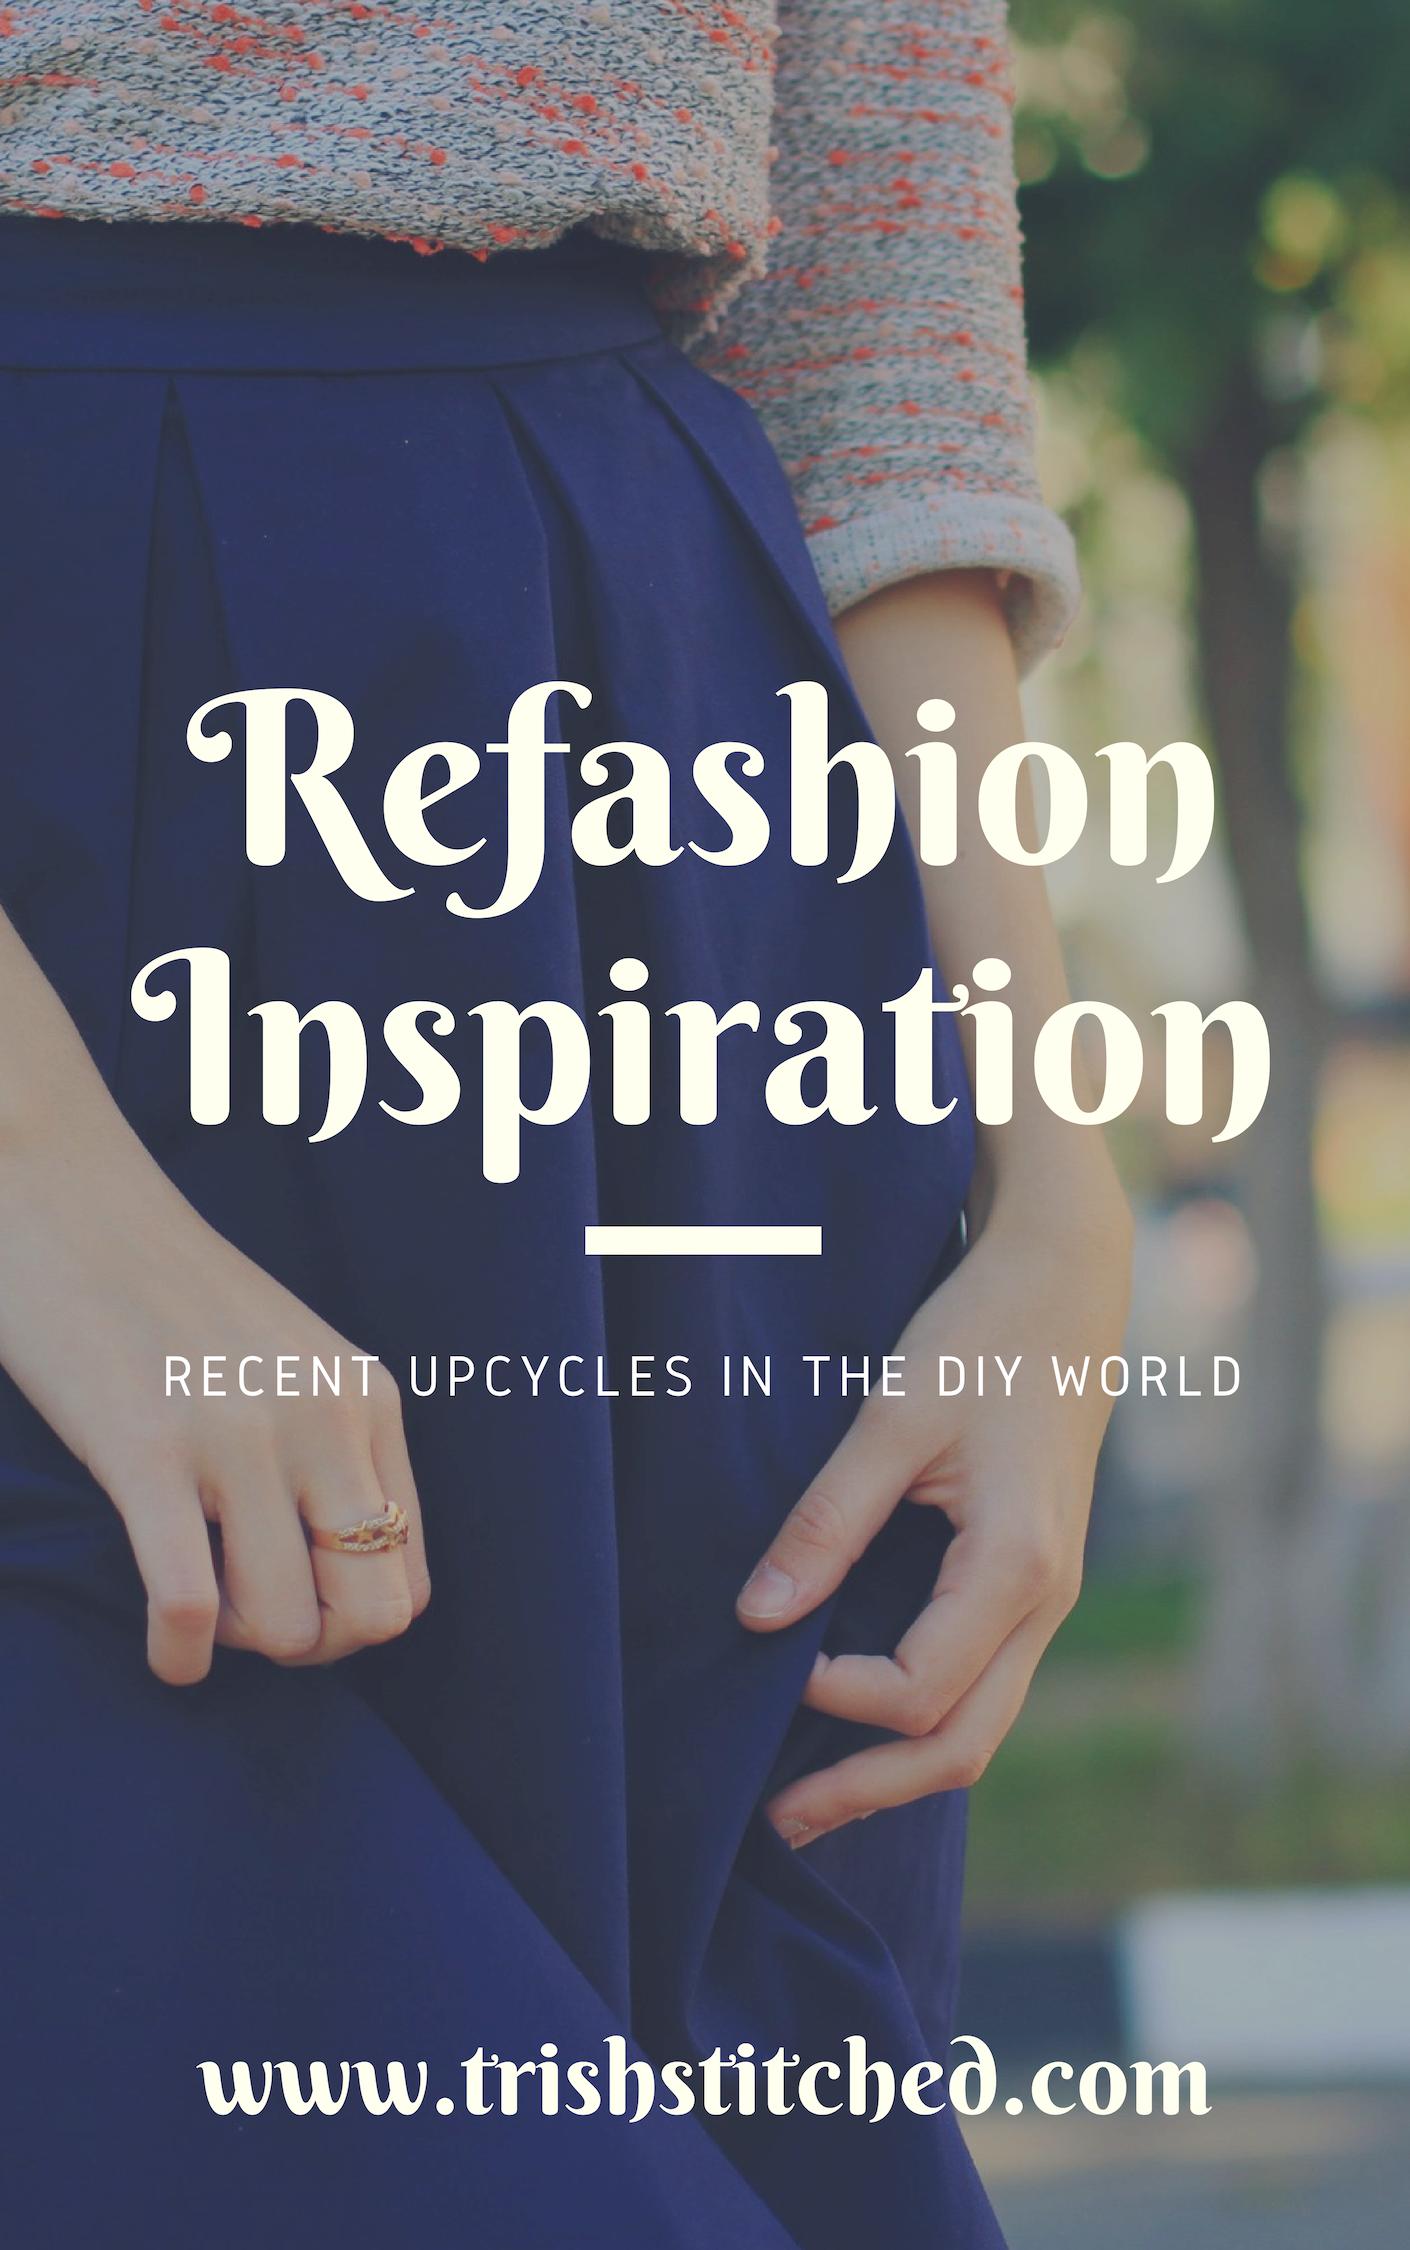 Refashion Inspiration